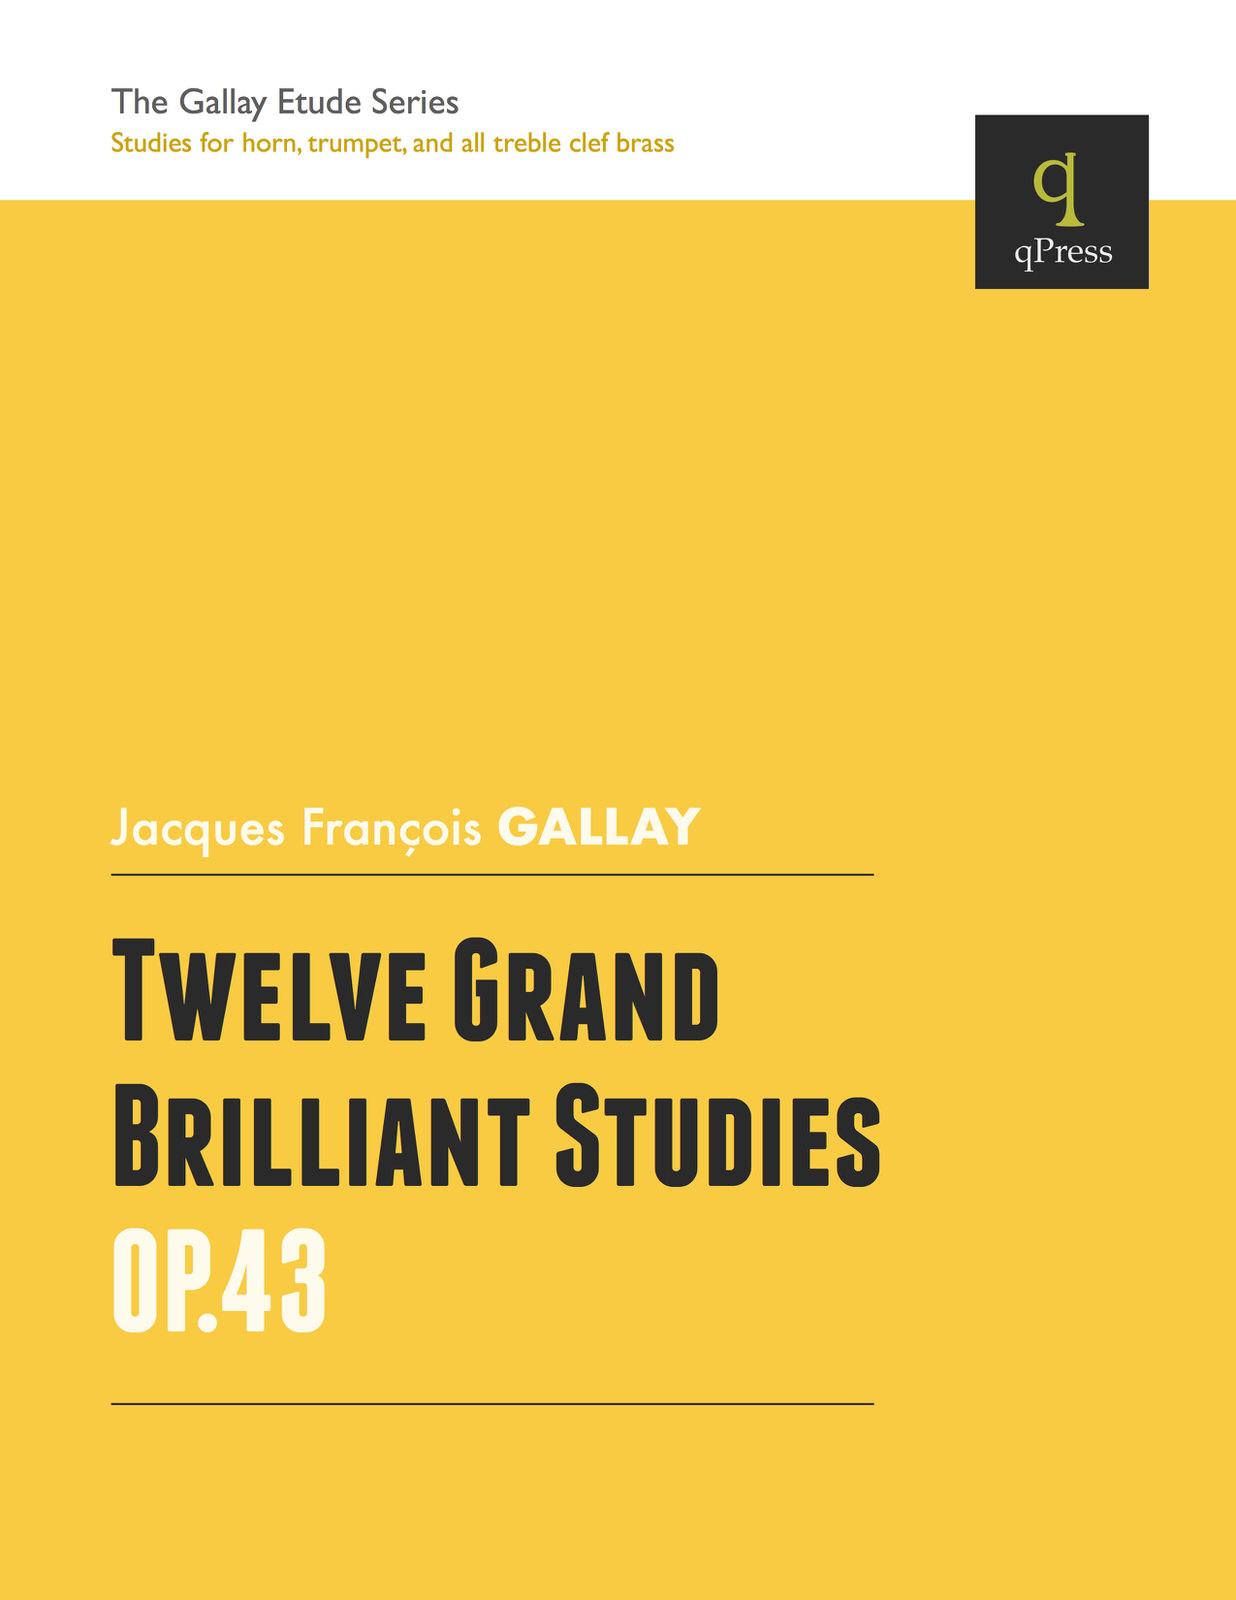 gallay-12-grand-brilliant-studies